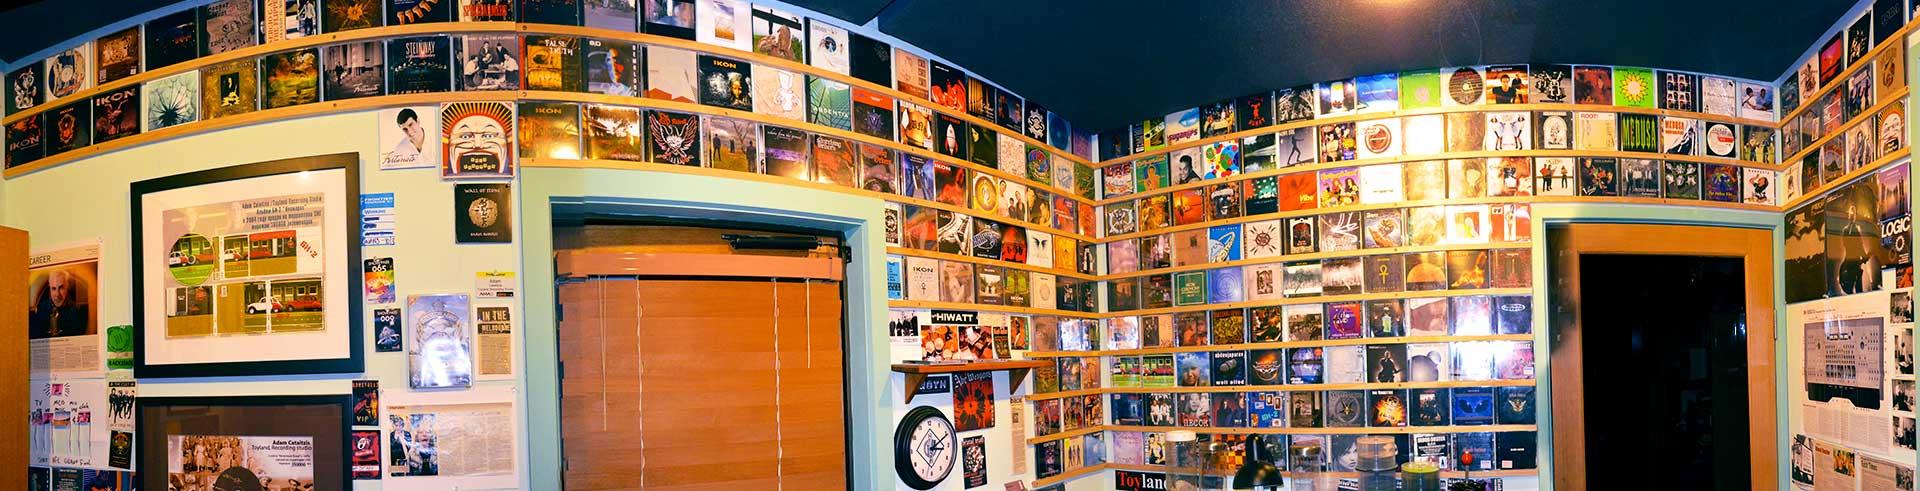 Toyland Recording Studio Melbourne CD room